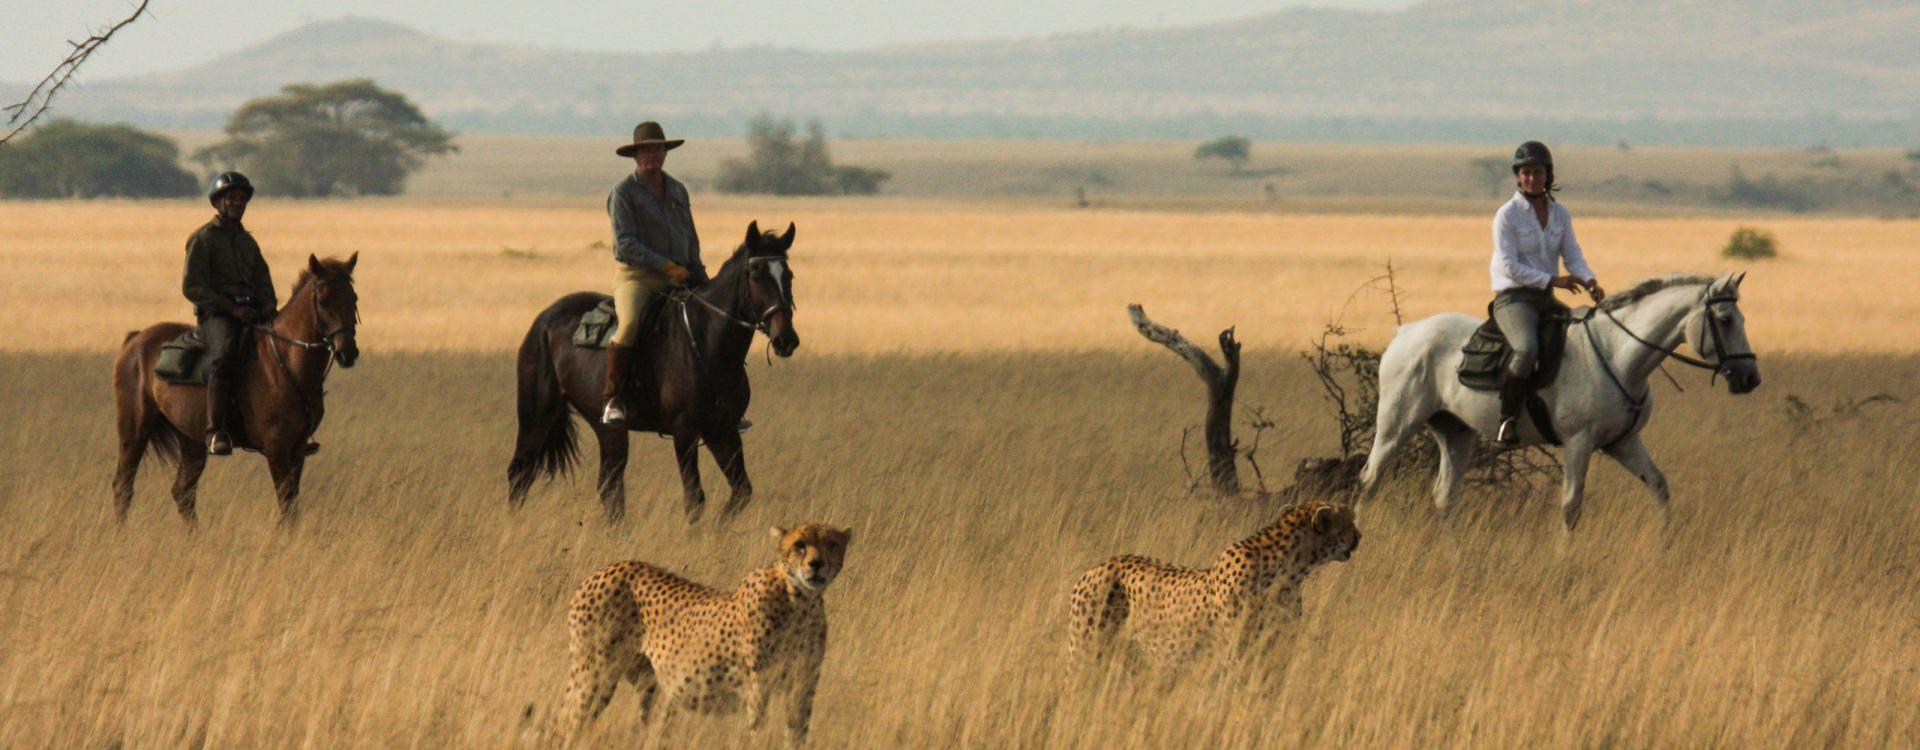 olDonyoLodge-Horse-Safari-Experience-GreatPlainsConservation-43.jpg